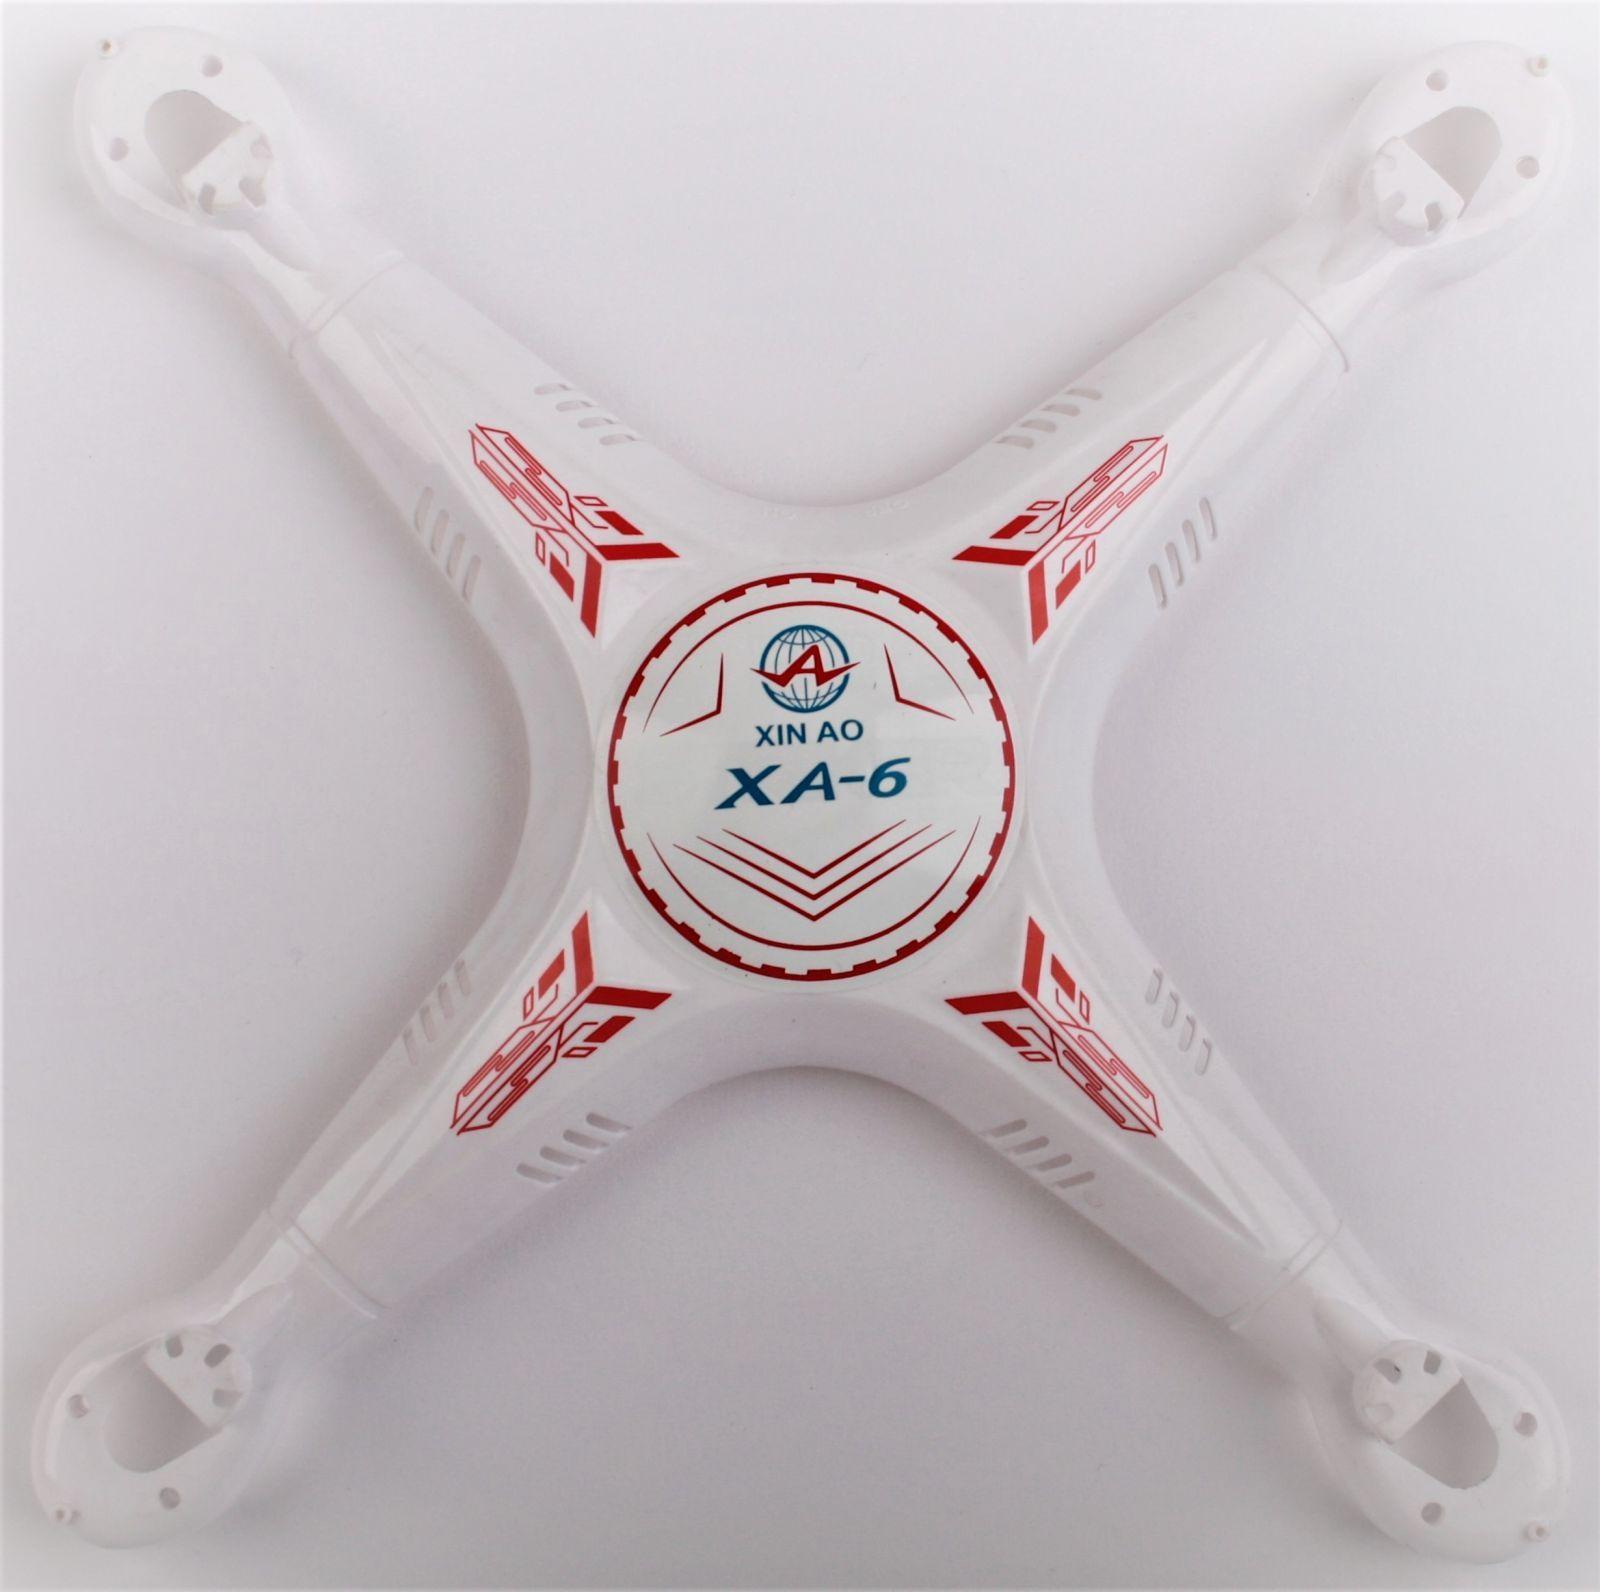 dron-striker-nahradni-dil